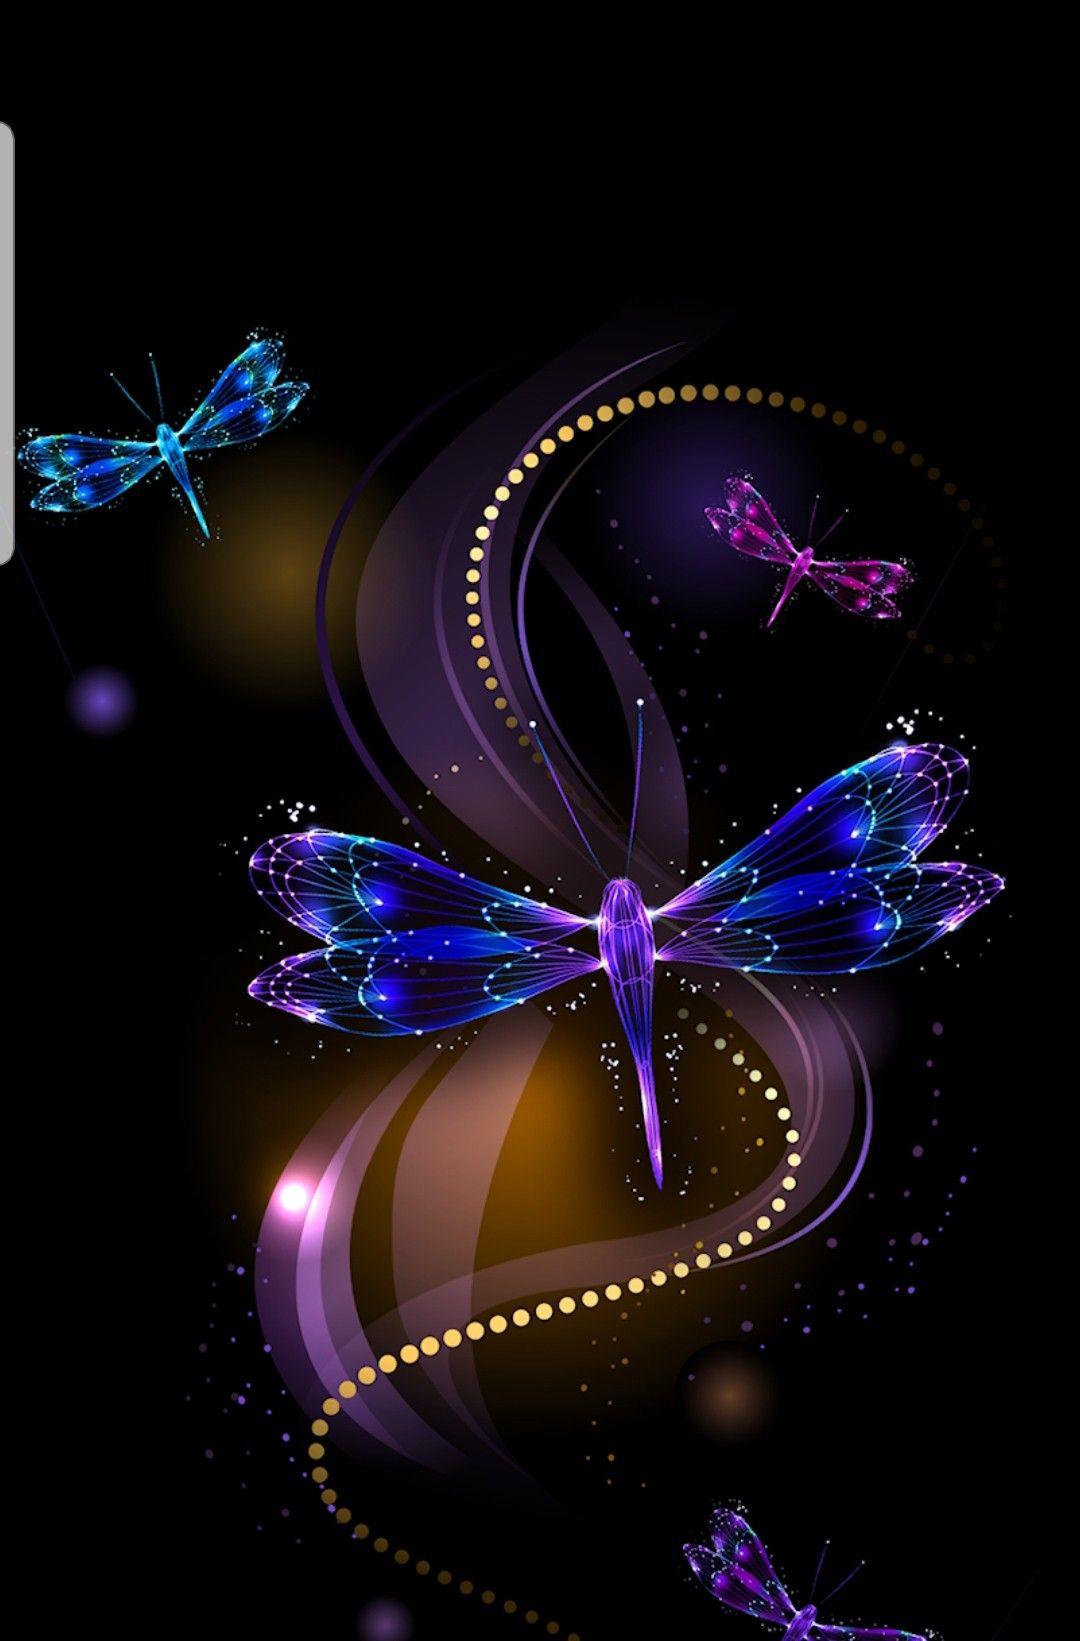 Wallpaper Mobile Dragonfly